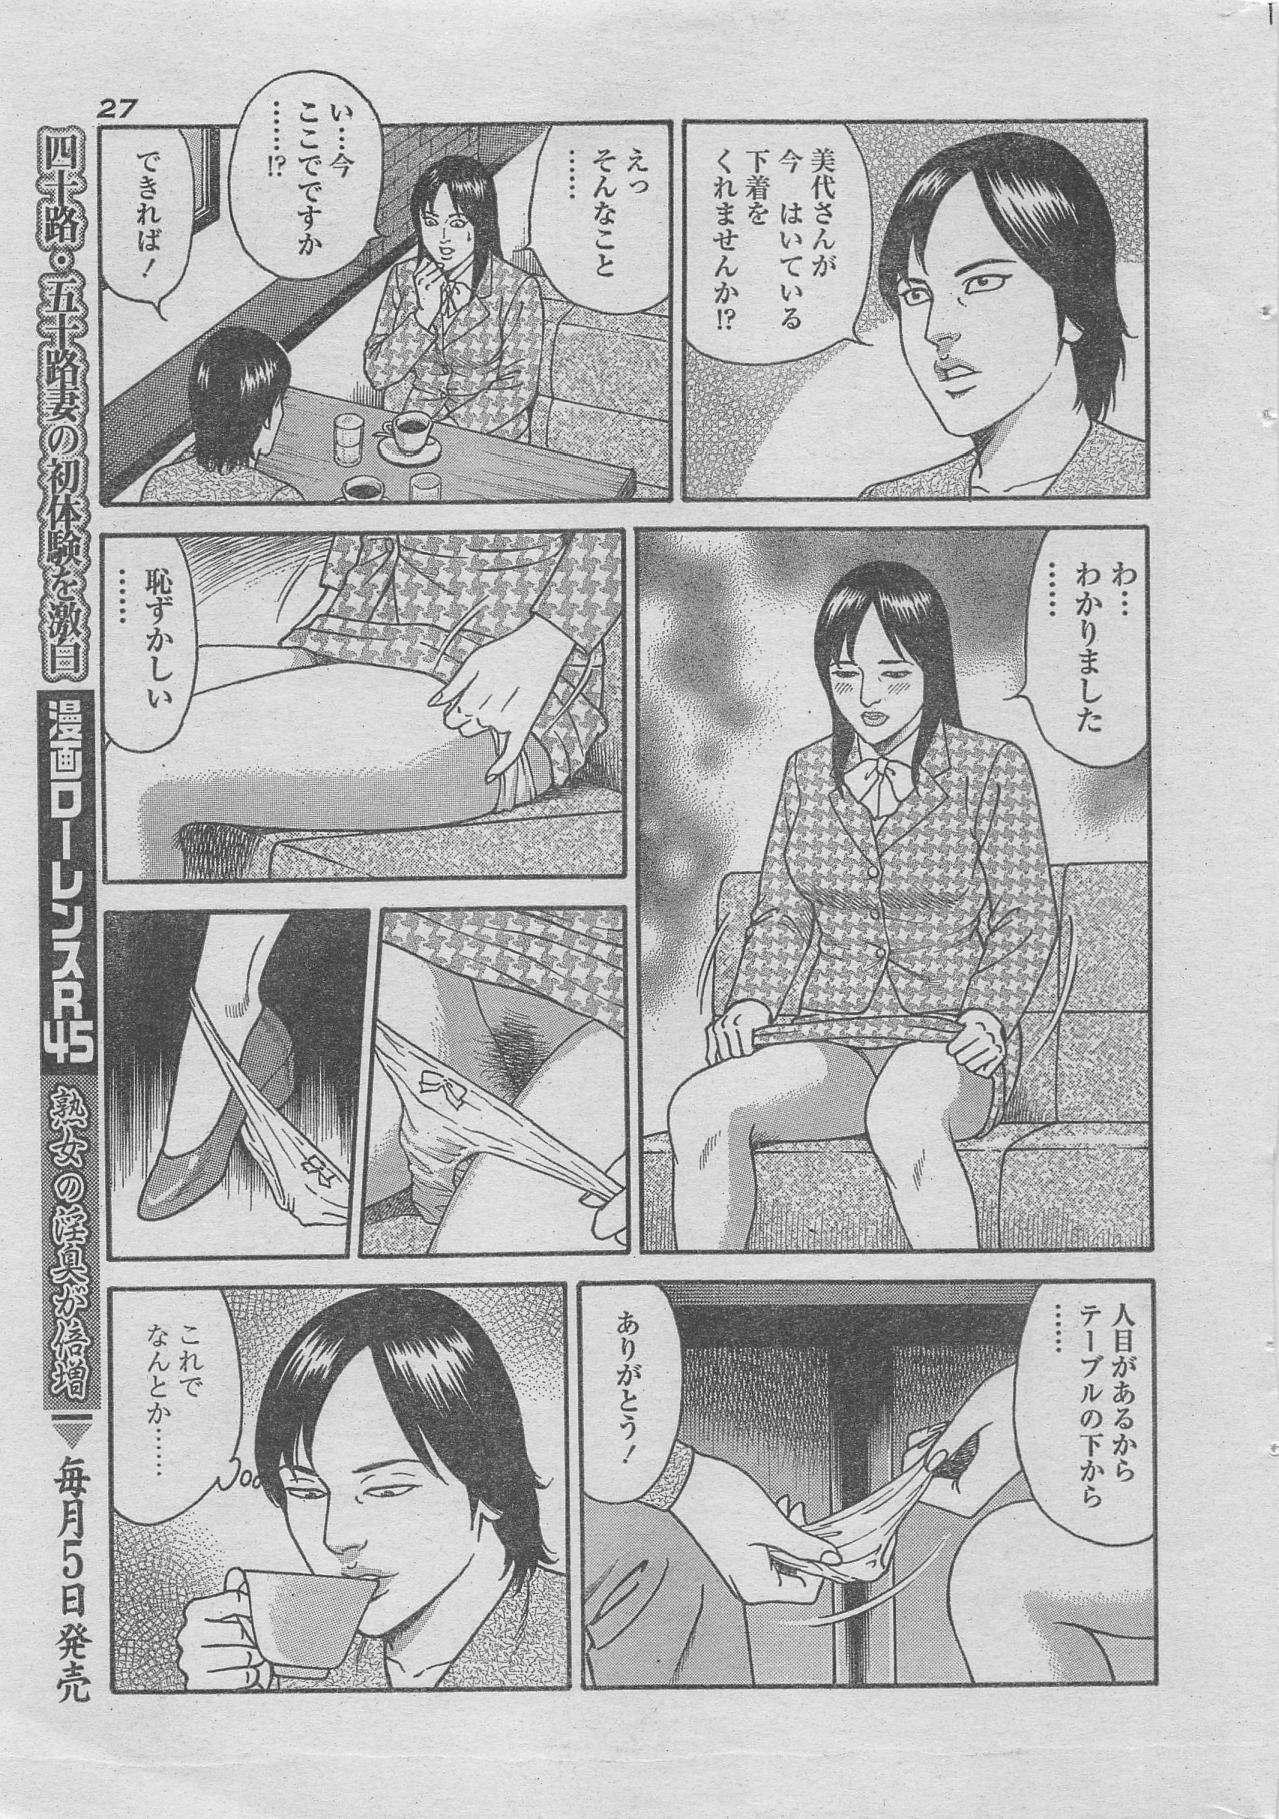 Manga Lawrence 2013-04 14